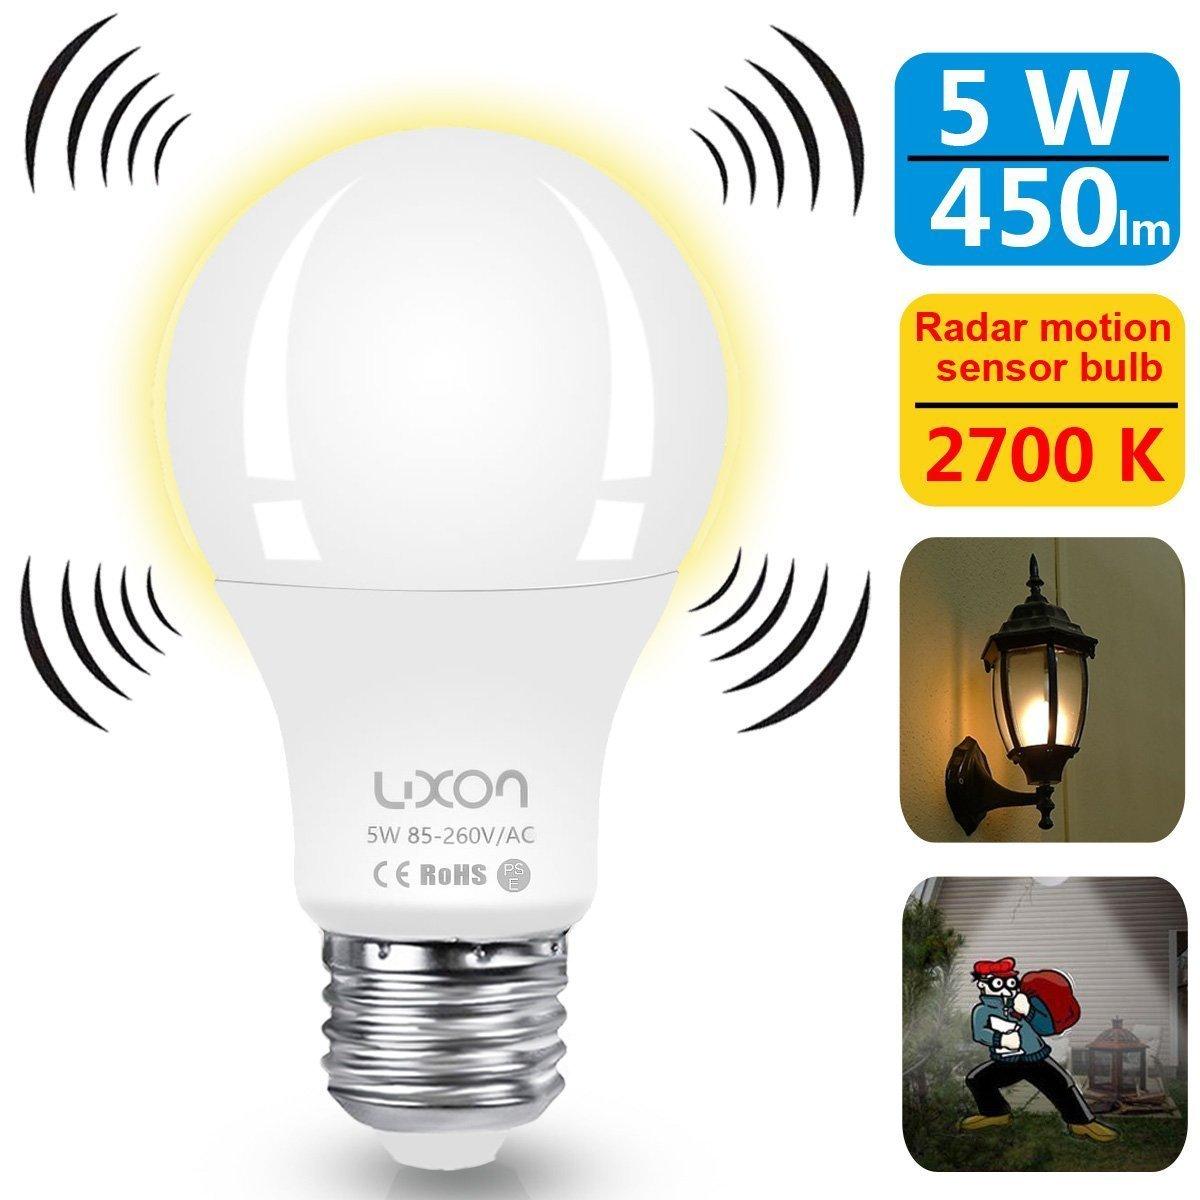 5 watt led bulb radar motion detector soft white 450 lumens $6.99 amazon prime